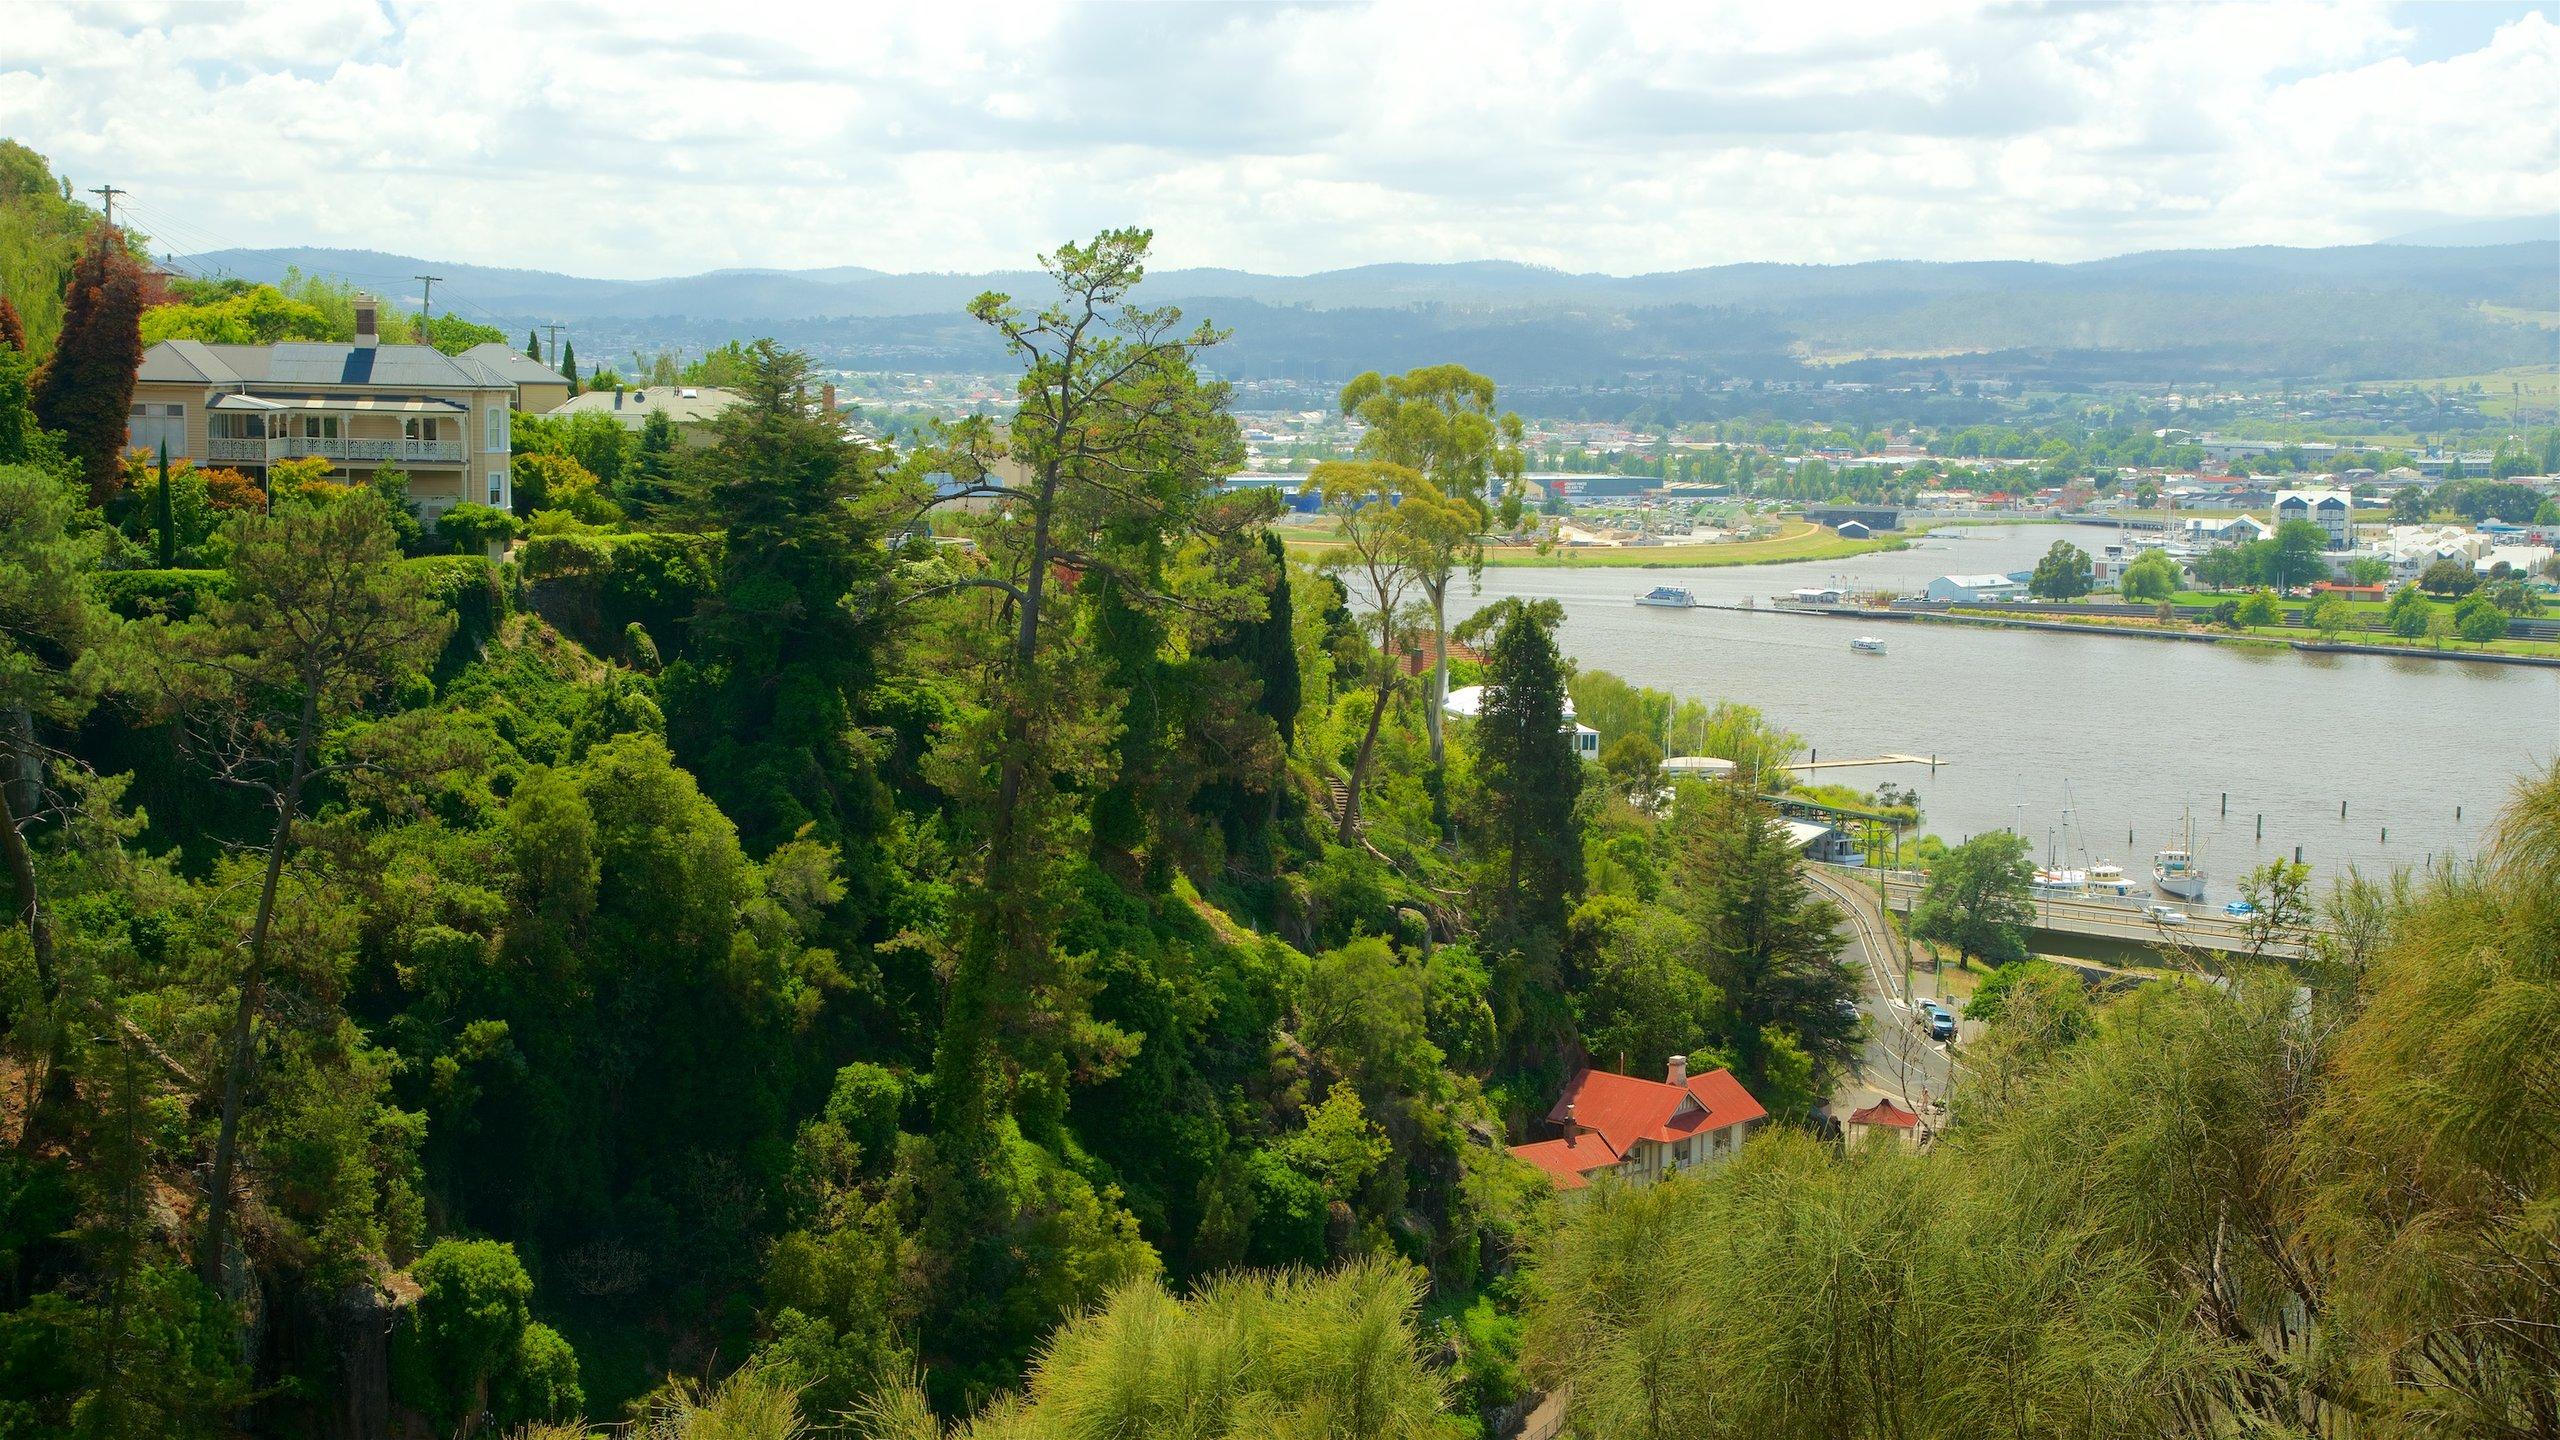 West Launceston, Launceston, Tasmania, Australia